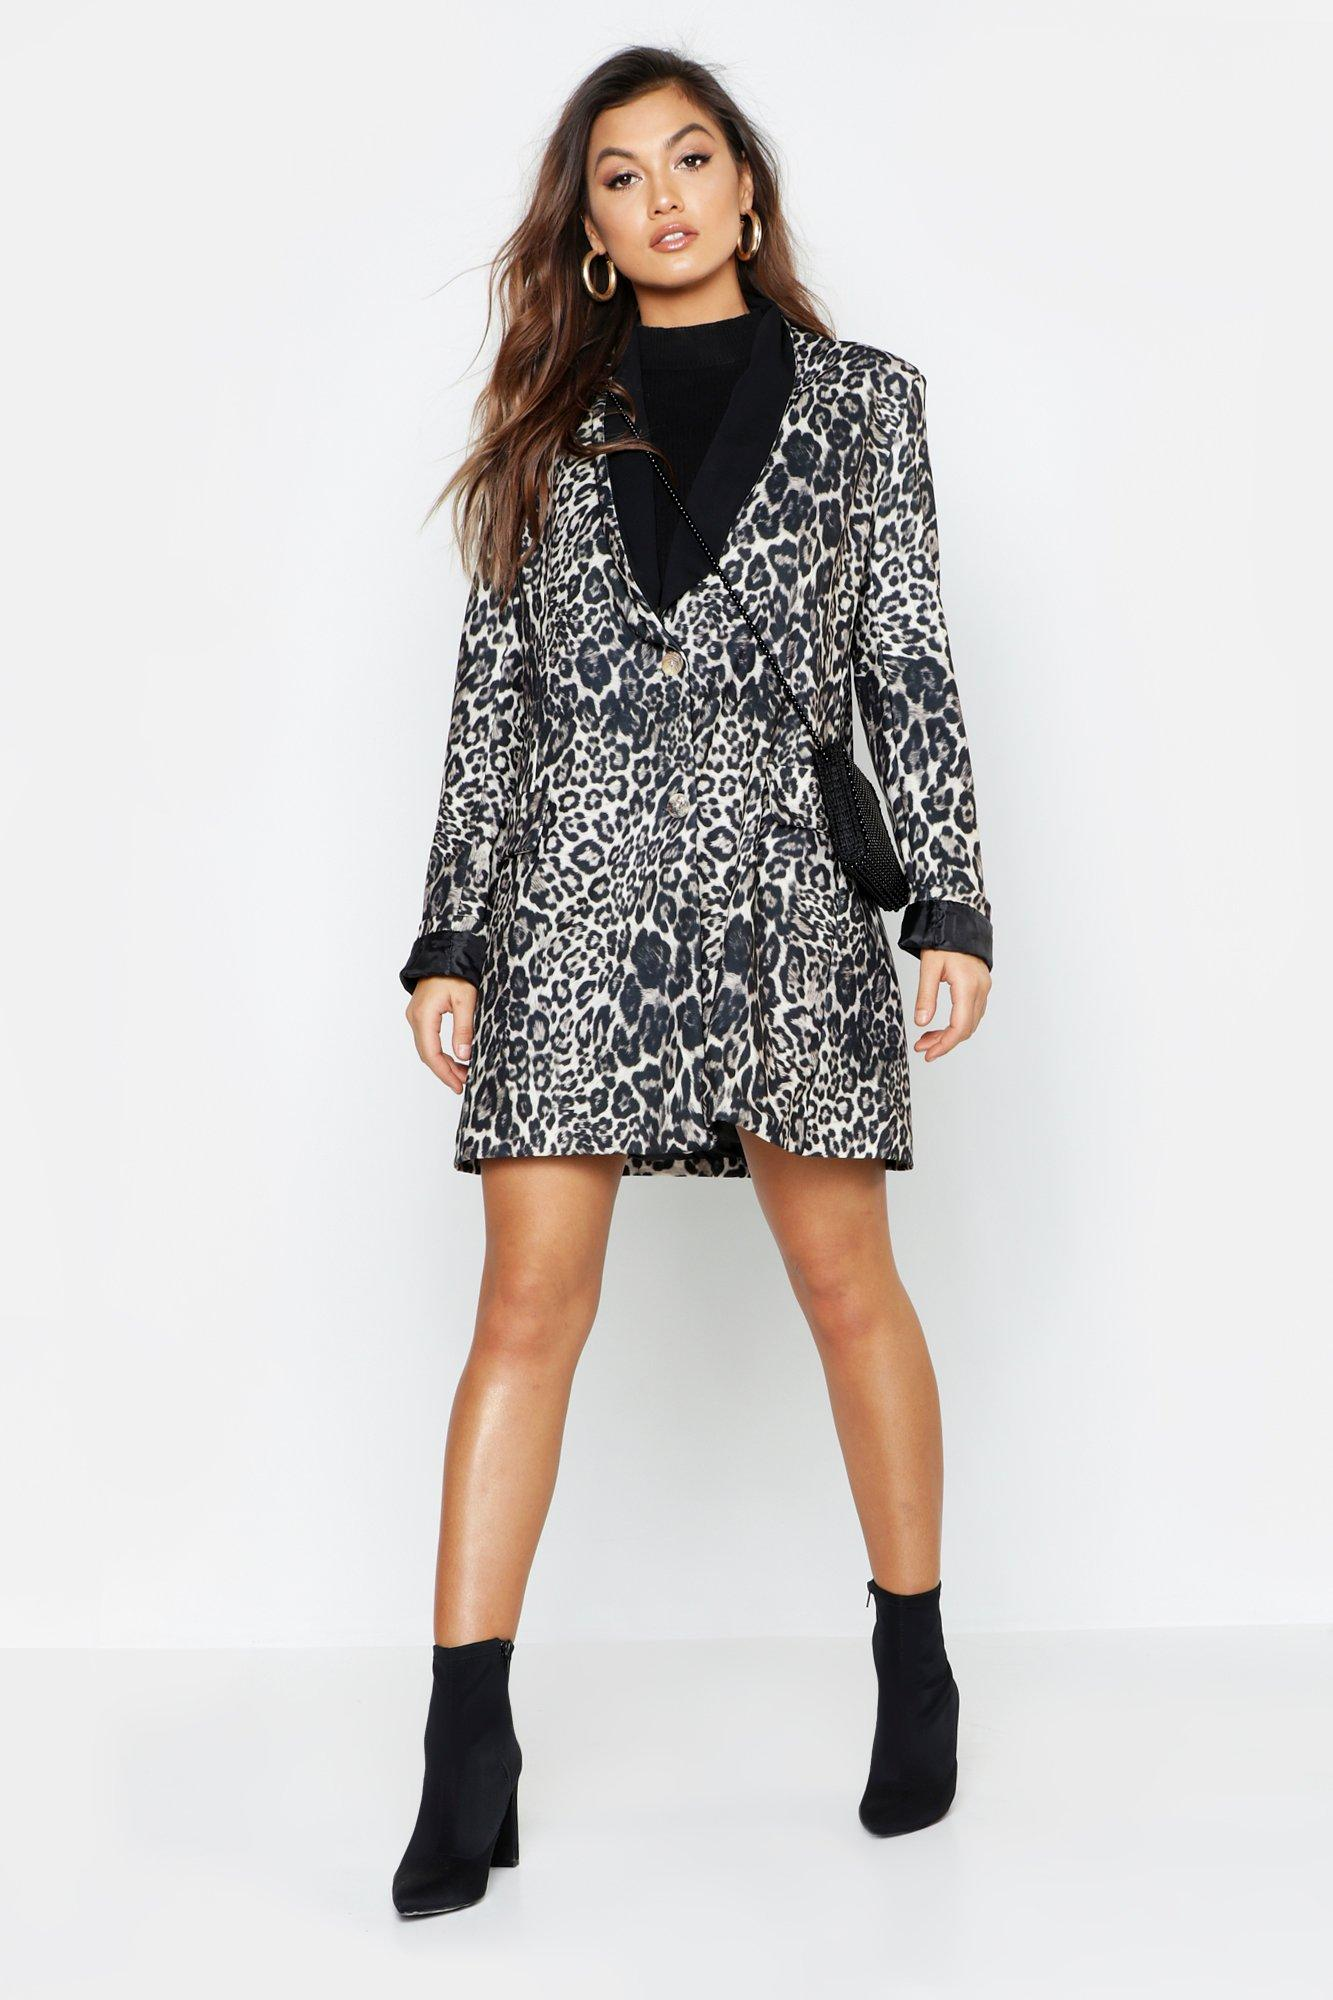 Leopard Print Contrast Print Blazer Dress